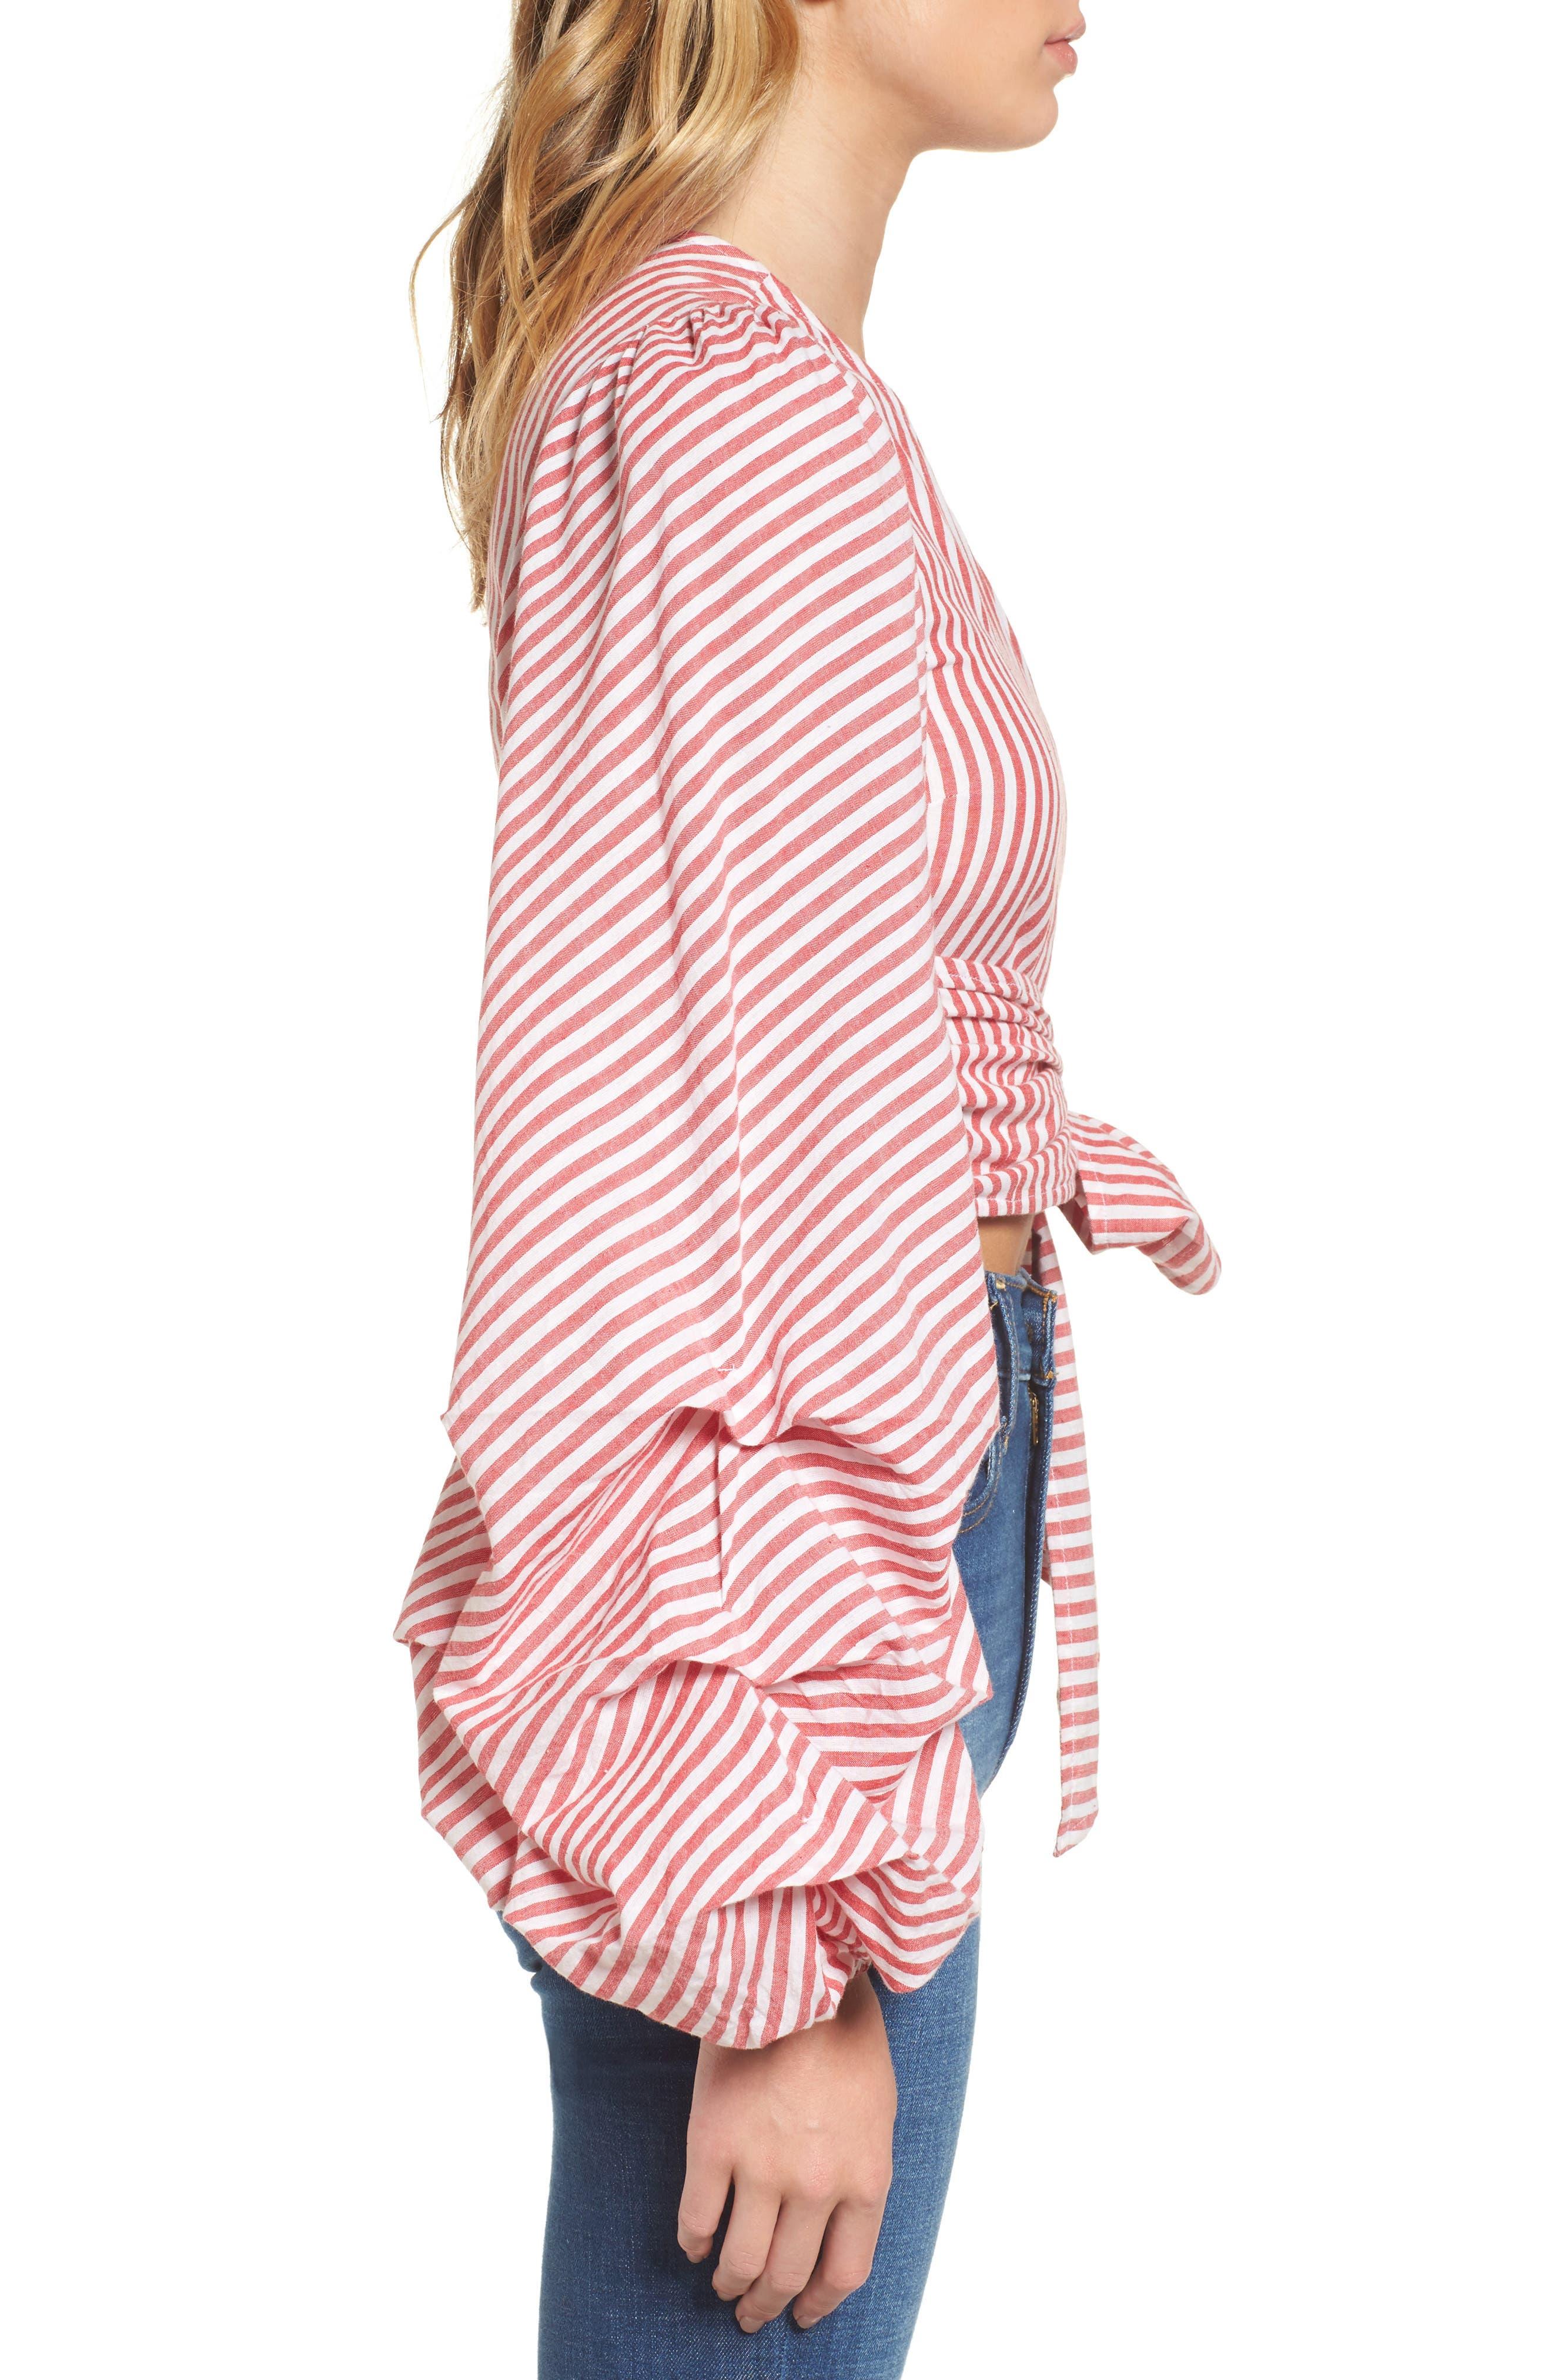 L'Academie Reckless One-Shoulder Wrap Blouse,                             Alternate thumbnail 3, color,                             Red/ White Stripe